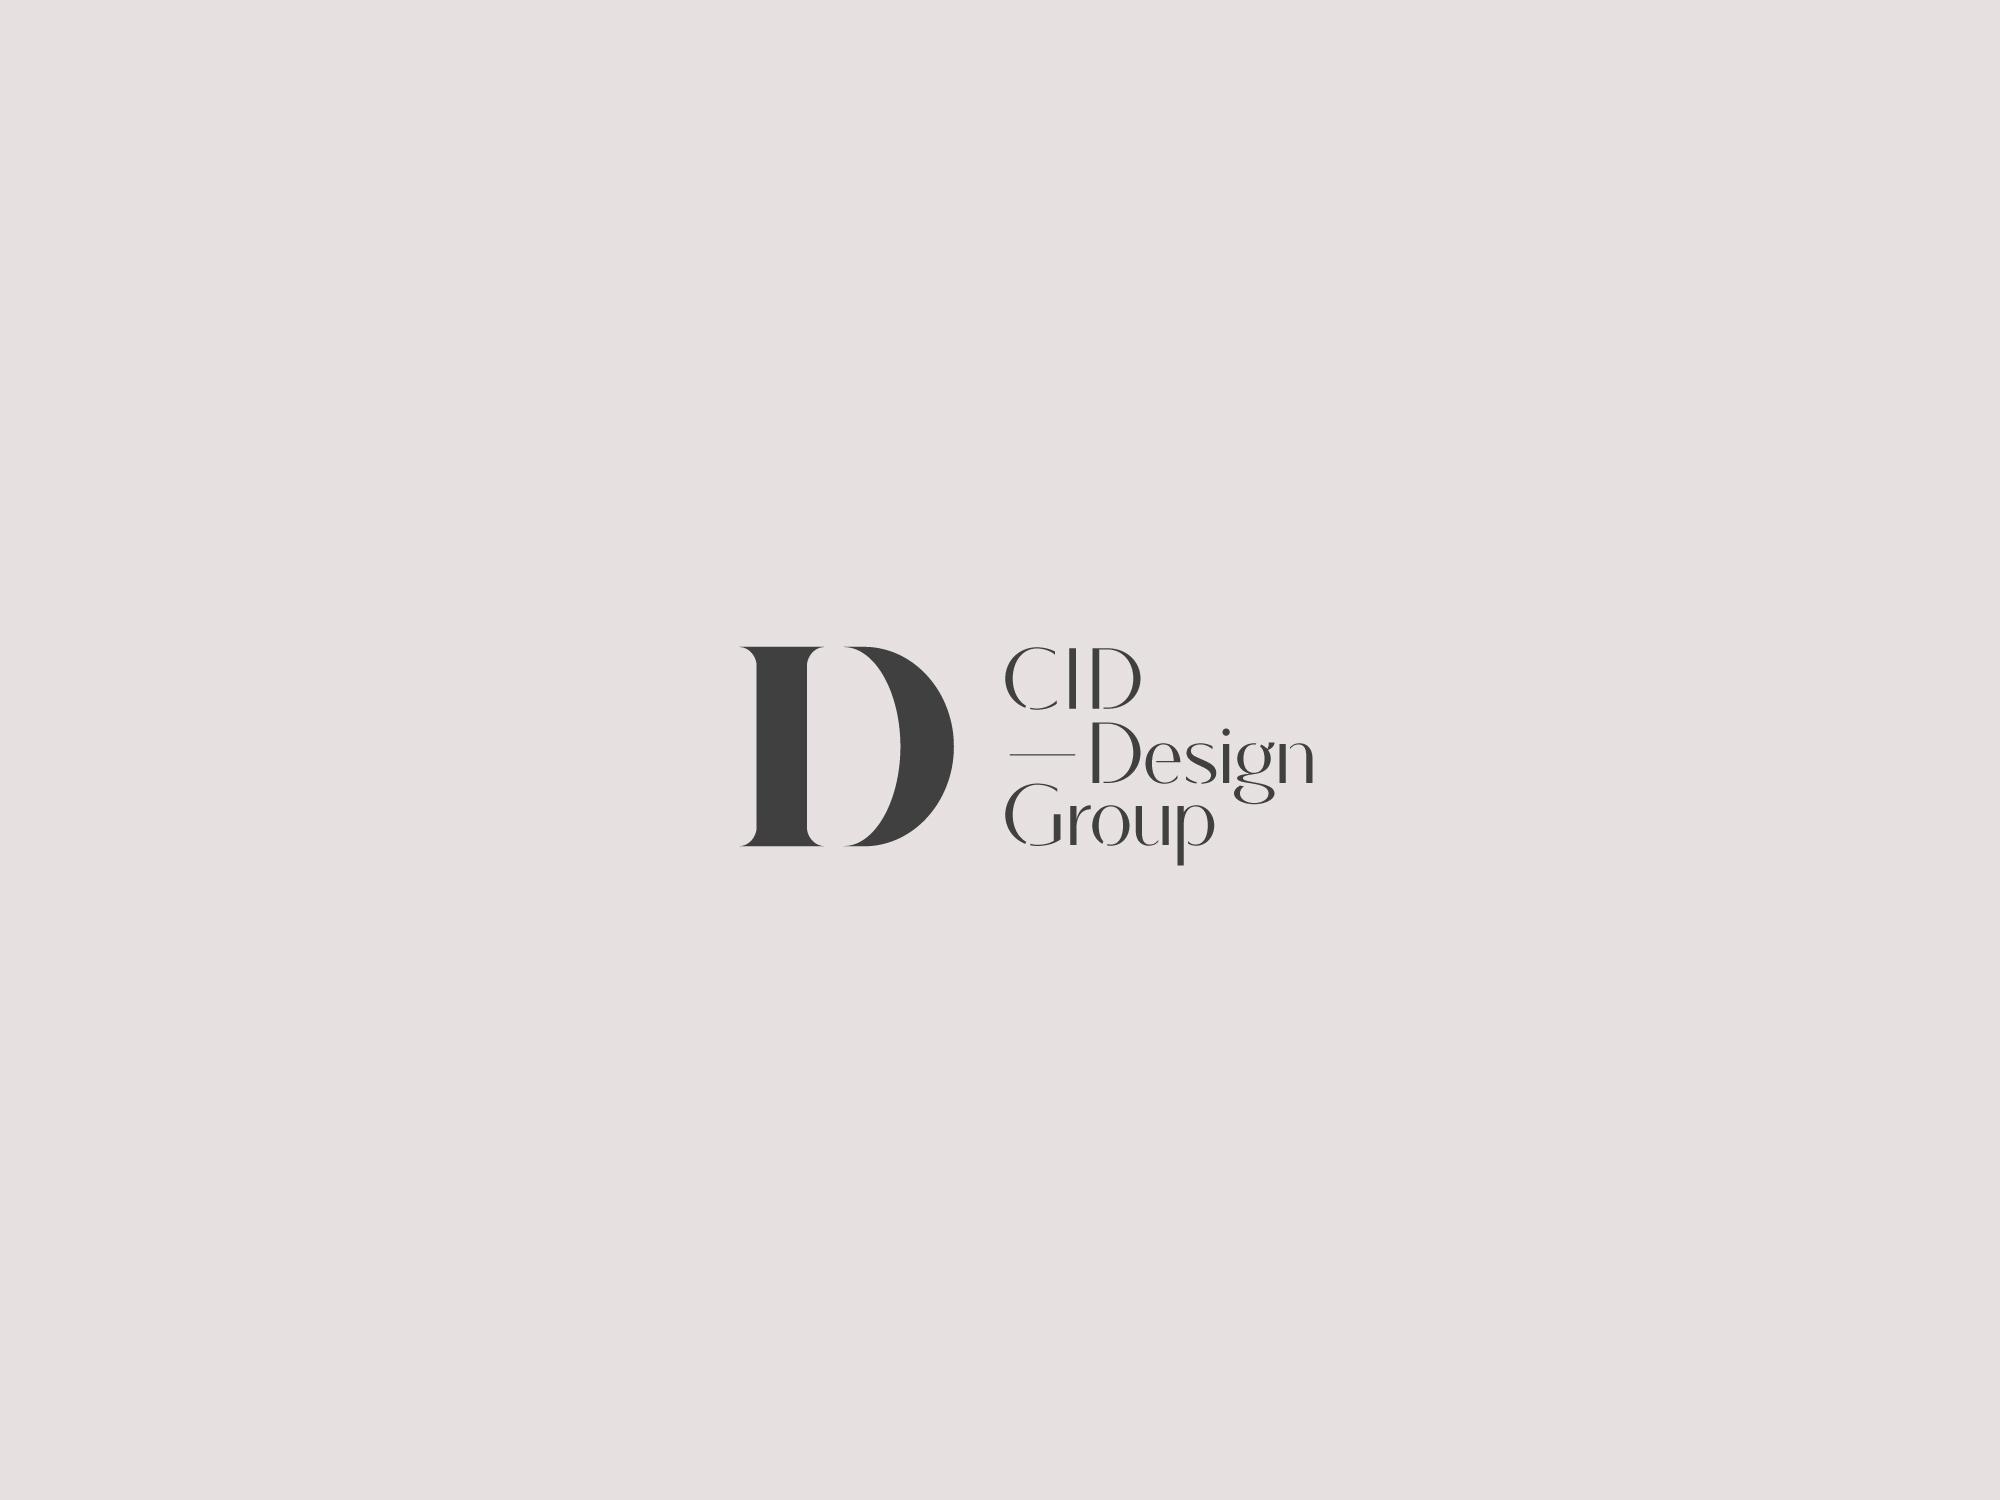 cid-logo.jpg